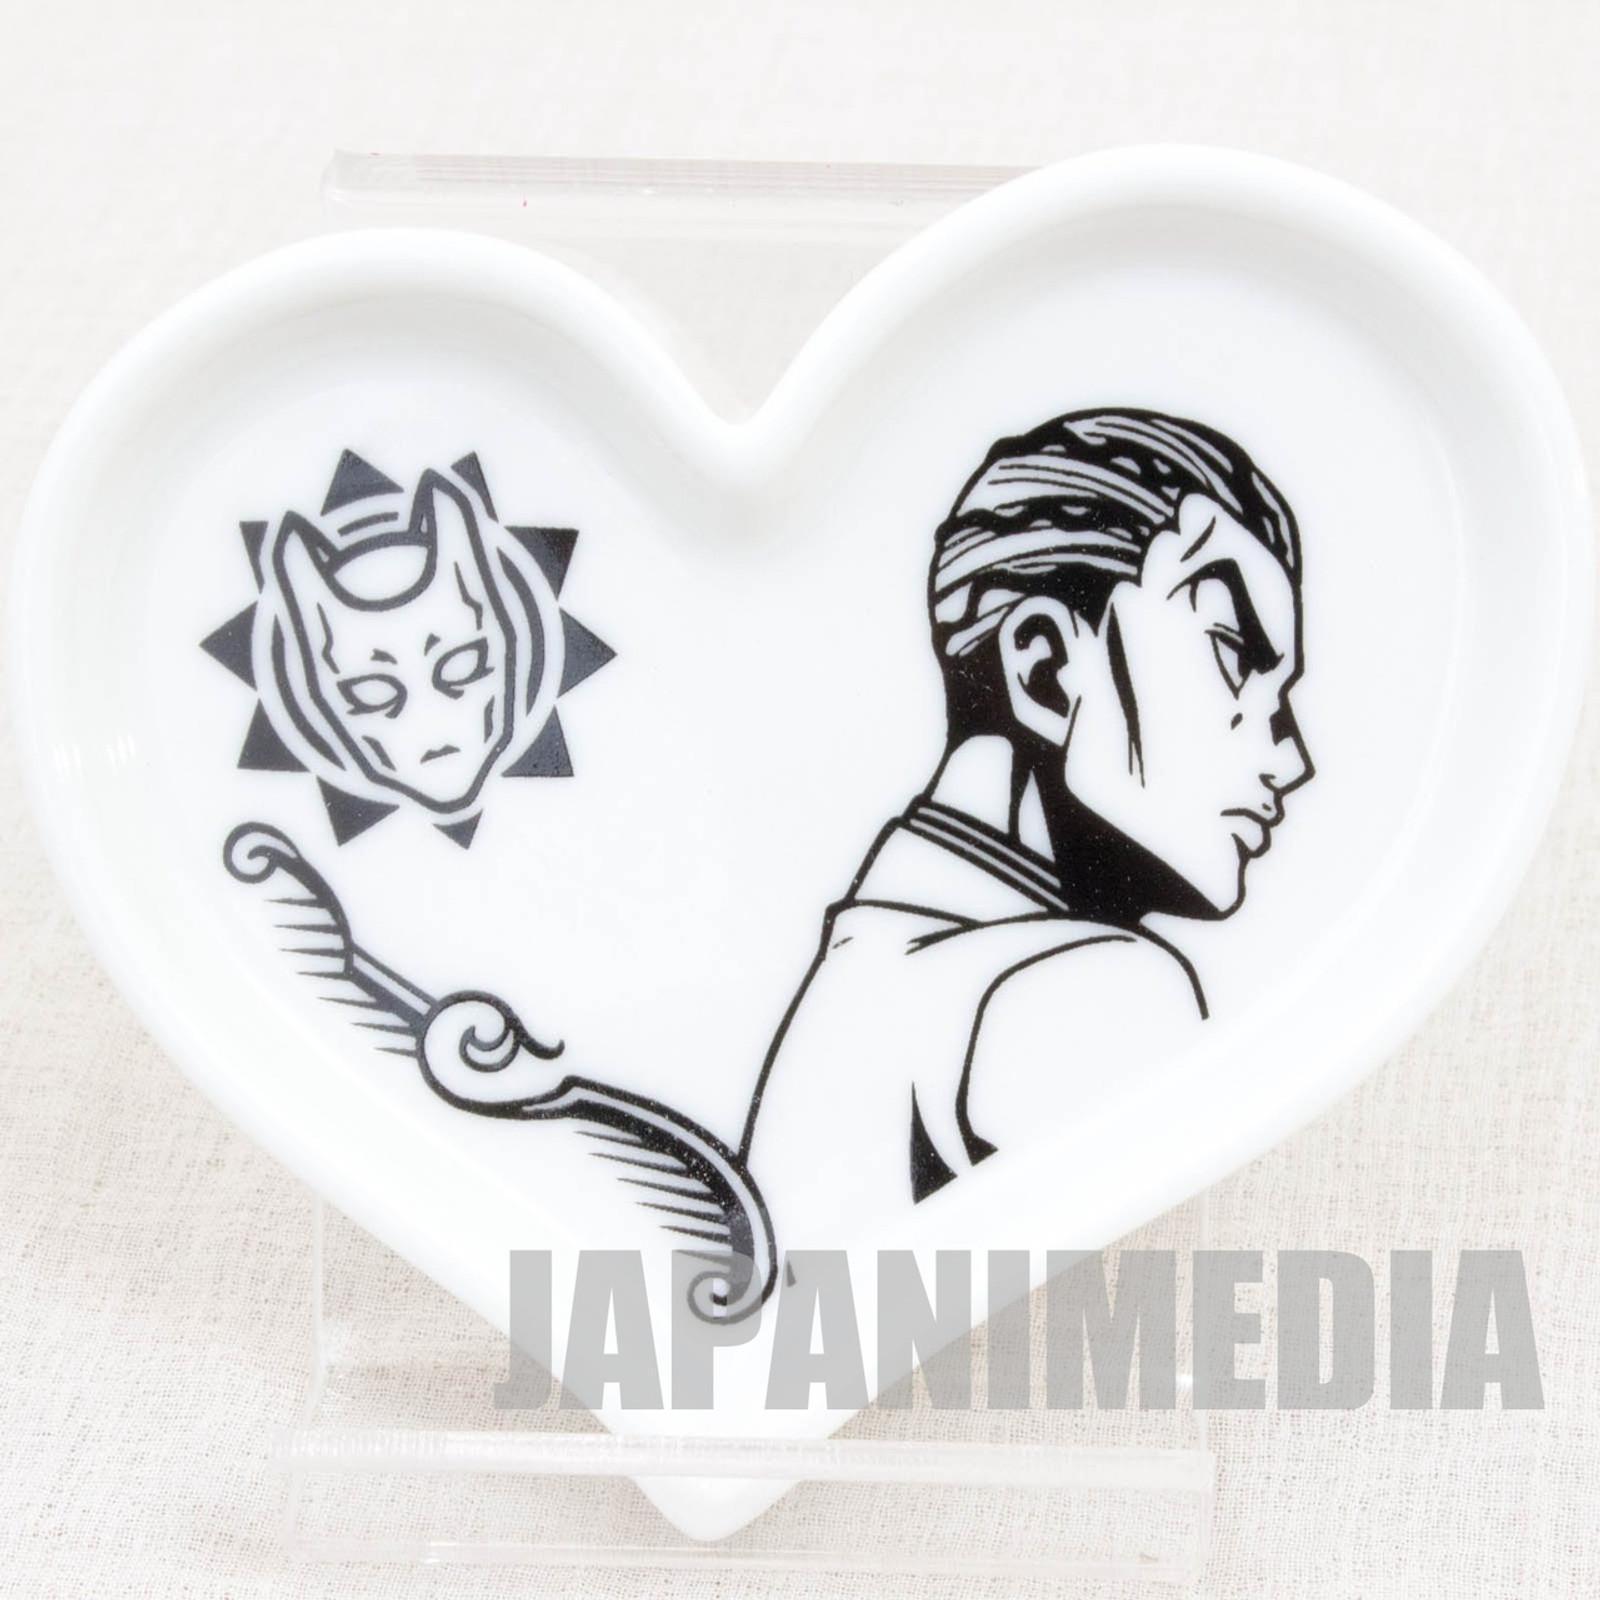 JoJo's Bizarre Adventure Diamond Is Unbreakable Kira Yoshikage Small Plate